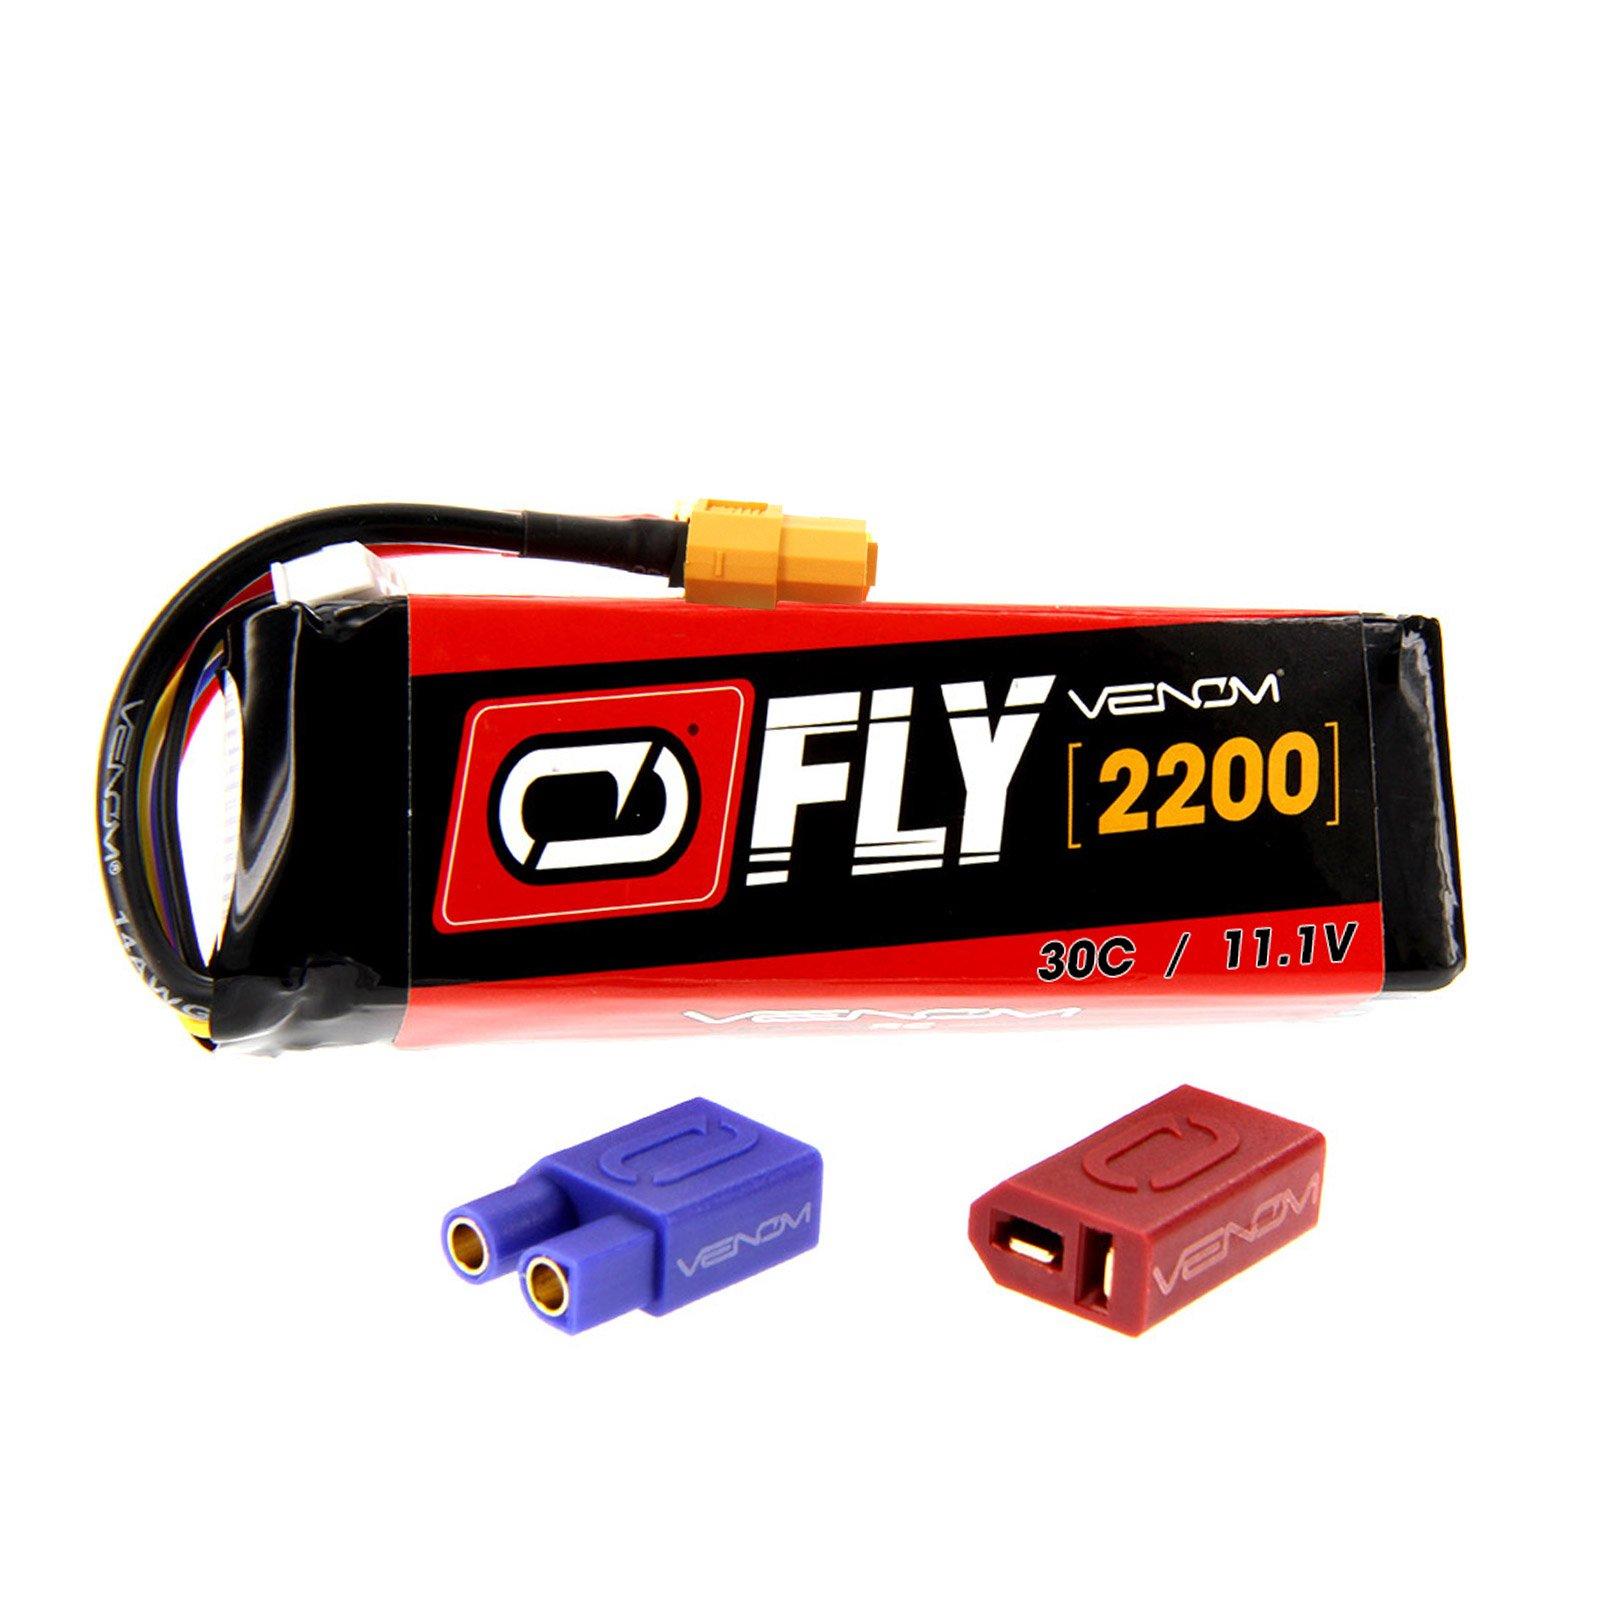 Venom Fly 30C 3S 2200mAh 11.1V LiPo Battery with UNI 2.0 Plug (XT60/Deans/EC3) - Compare to E-flite EFLB22003S30